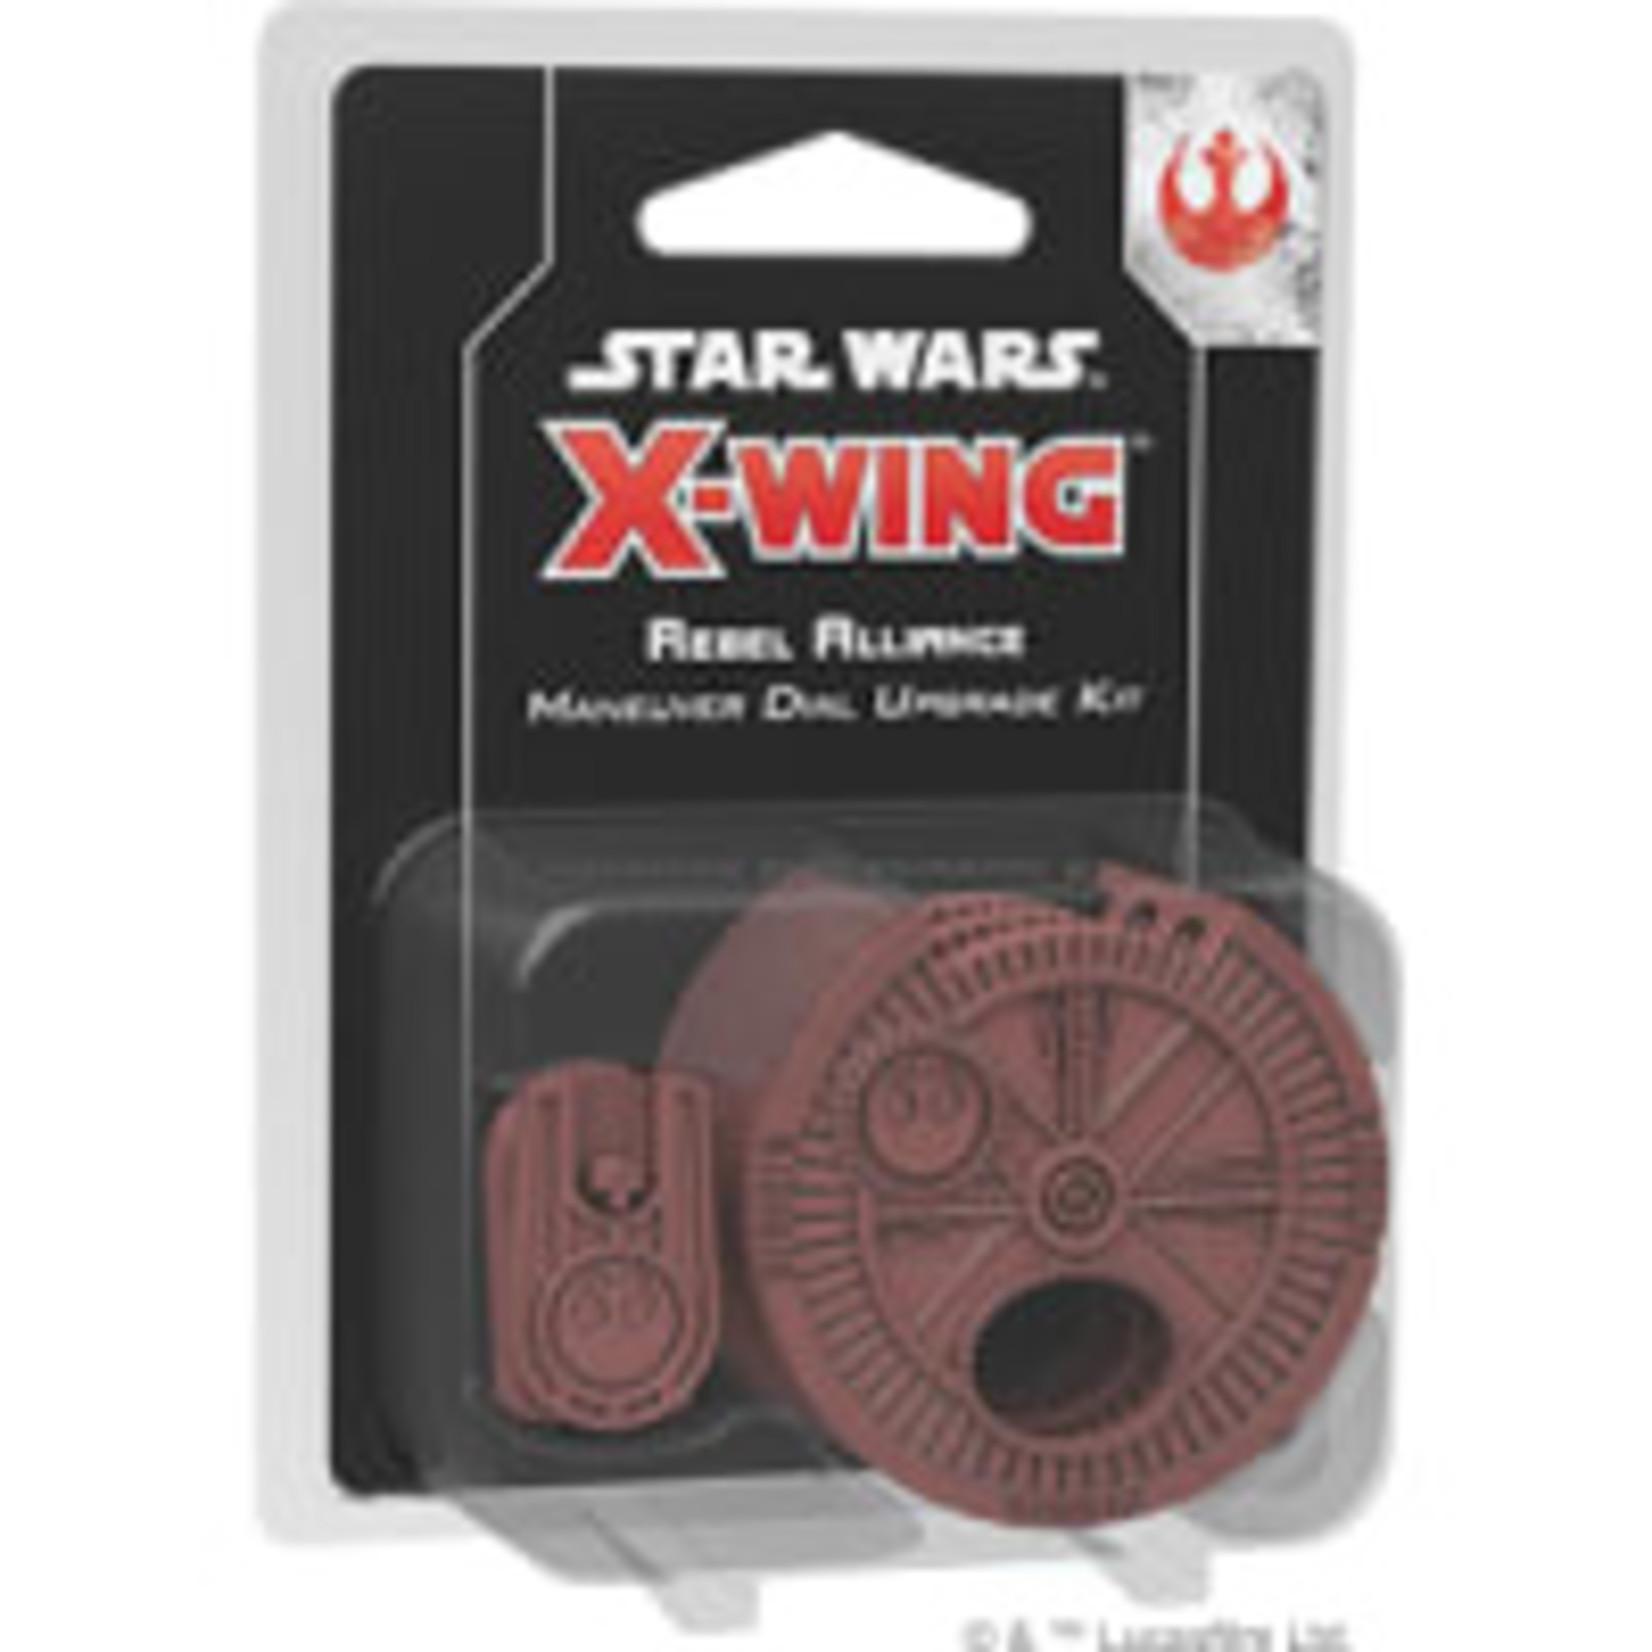 Fantasy Flight Games Star Wars X-Wing 2nd Edition: Rebel Alliance Maneuver Dial Upgrade Kit